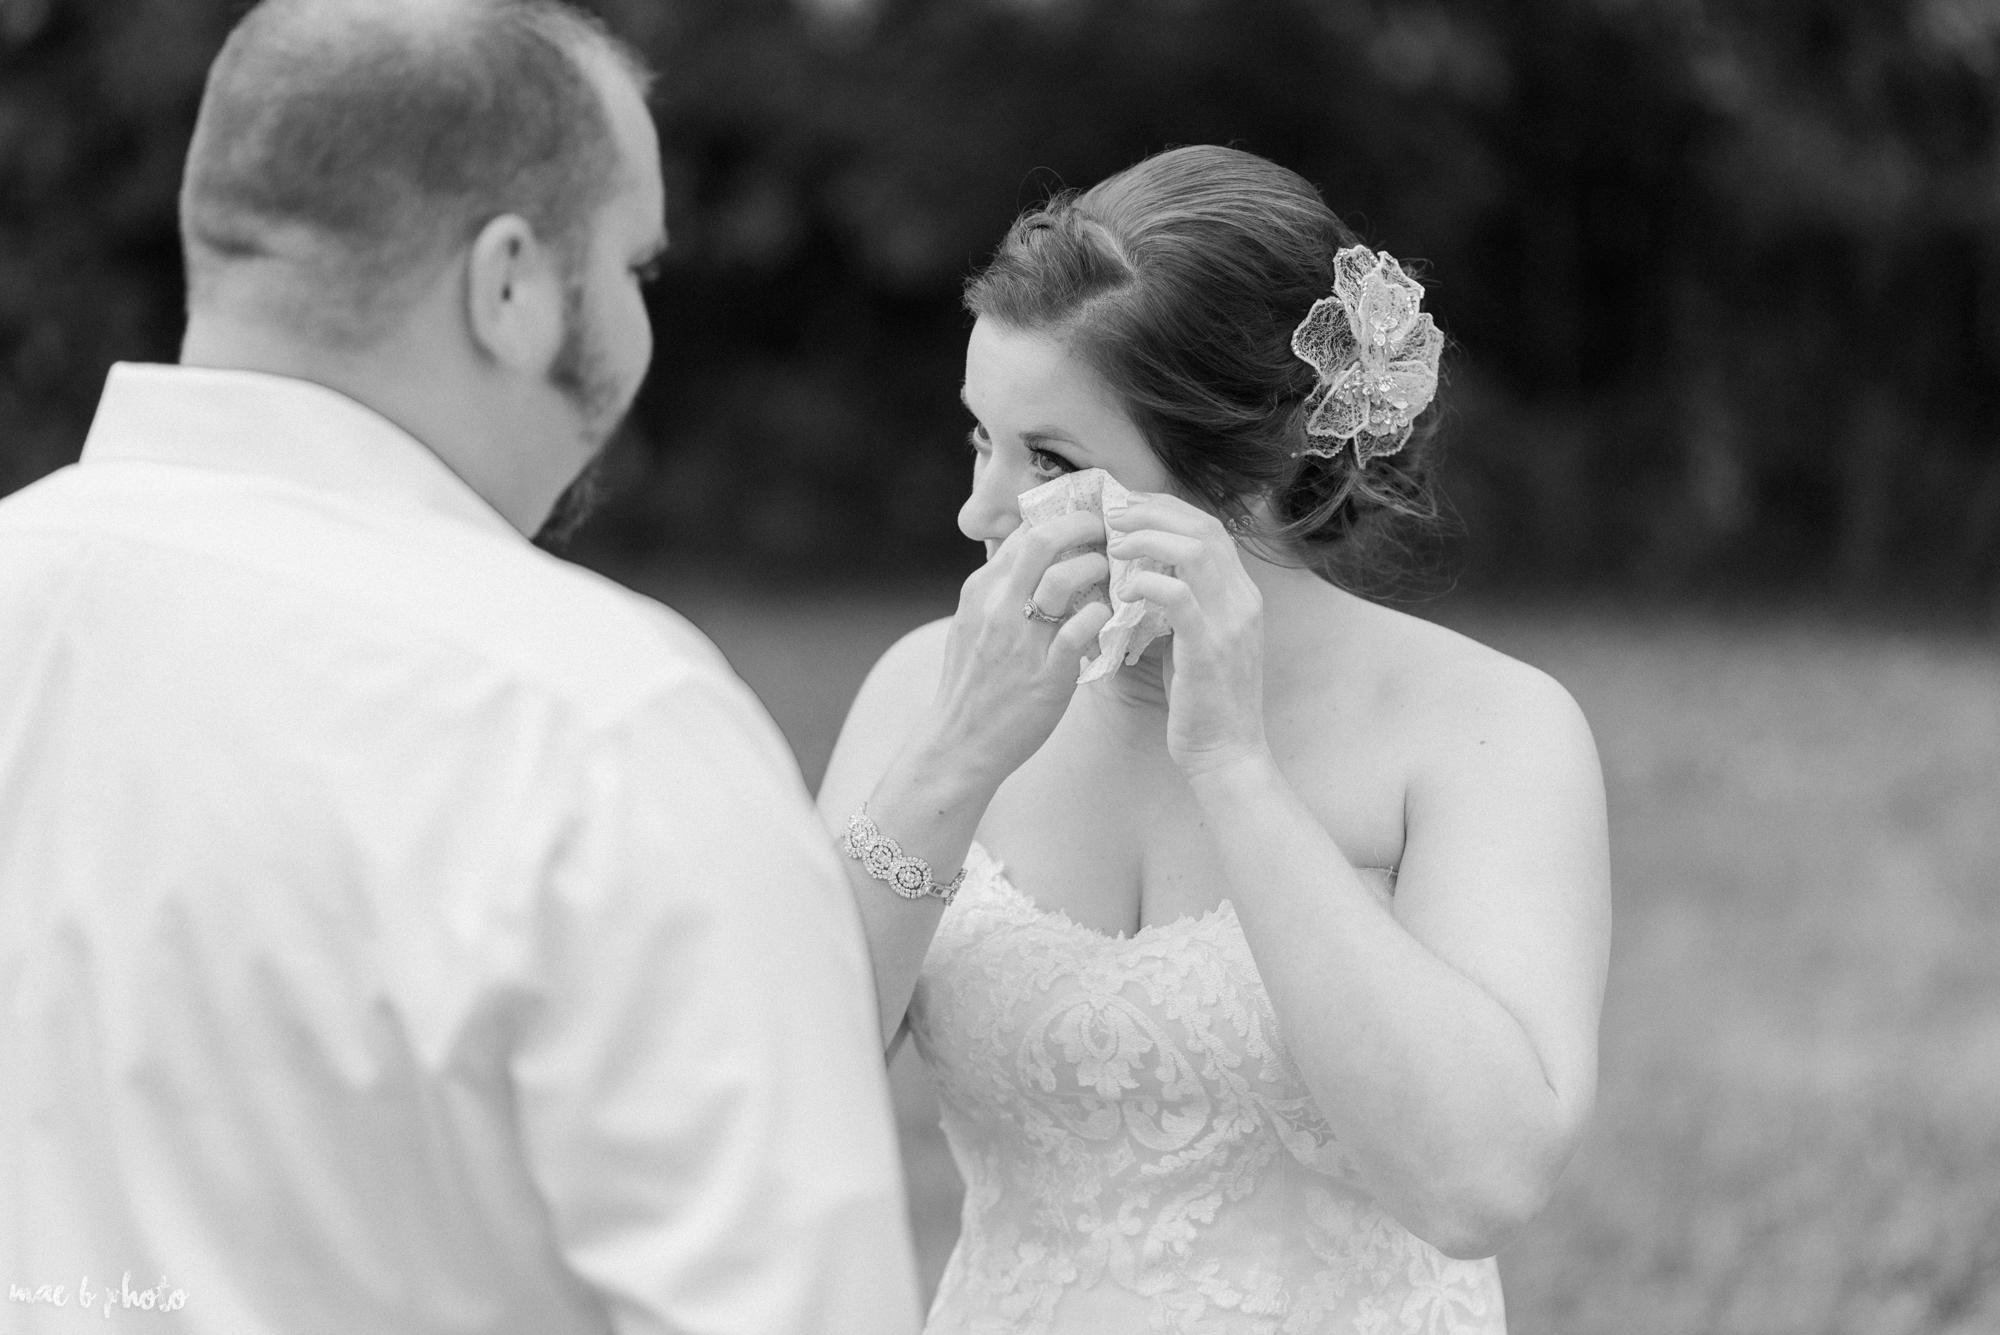 Sarah & Dustin's Rustic Chic Barn Wedding at Hartford Hill Winery in Hartford, Ohio by Mae B Photo-63.jpg